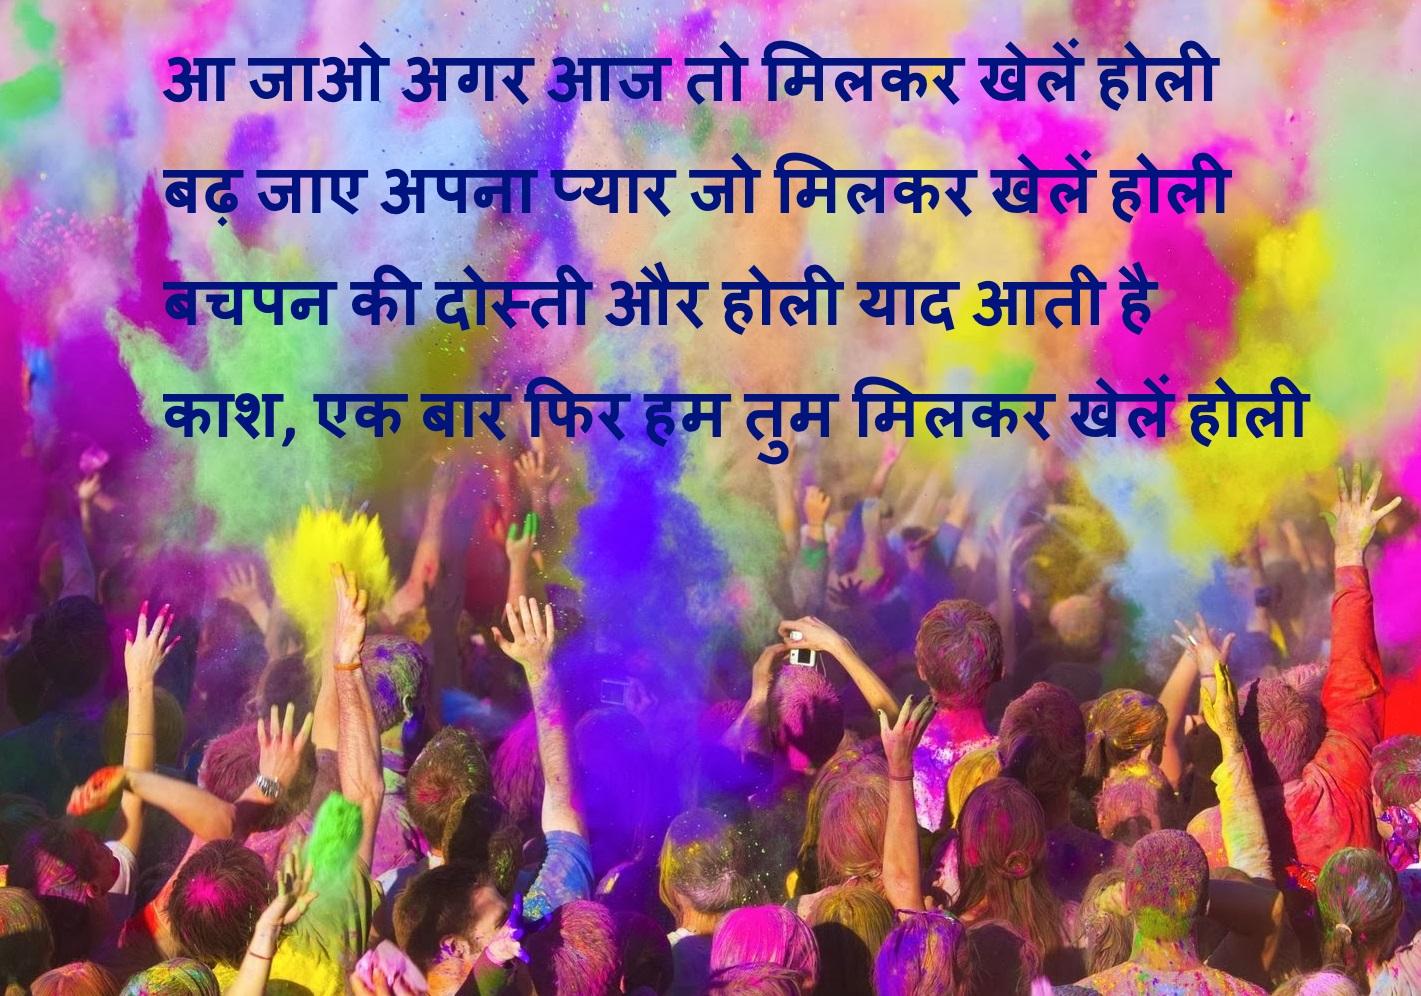 Holi shayari wishes sms in hindi and english holi shayari kristyandbryce Images